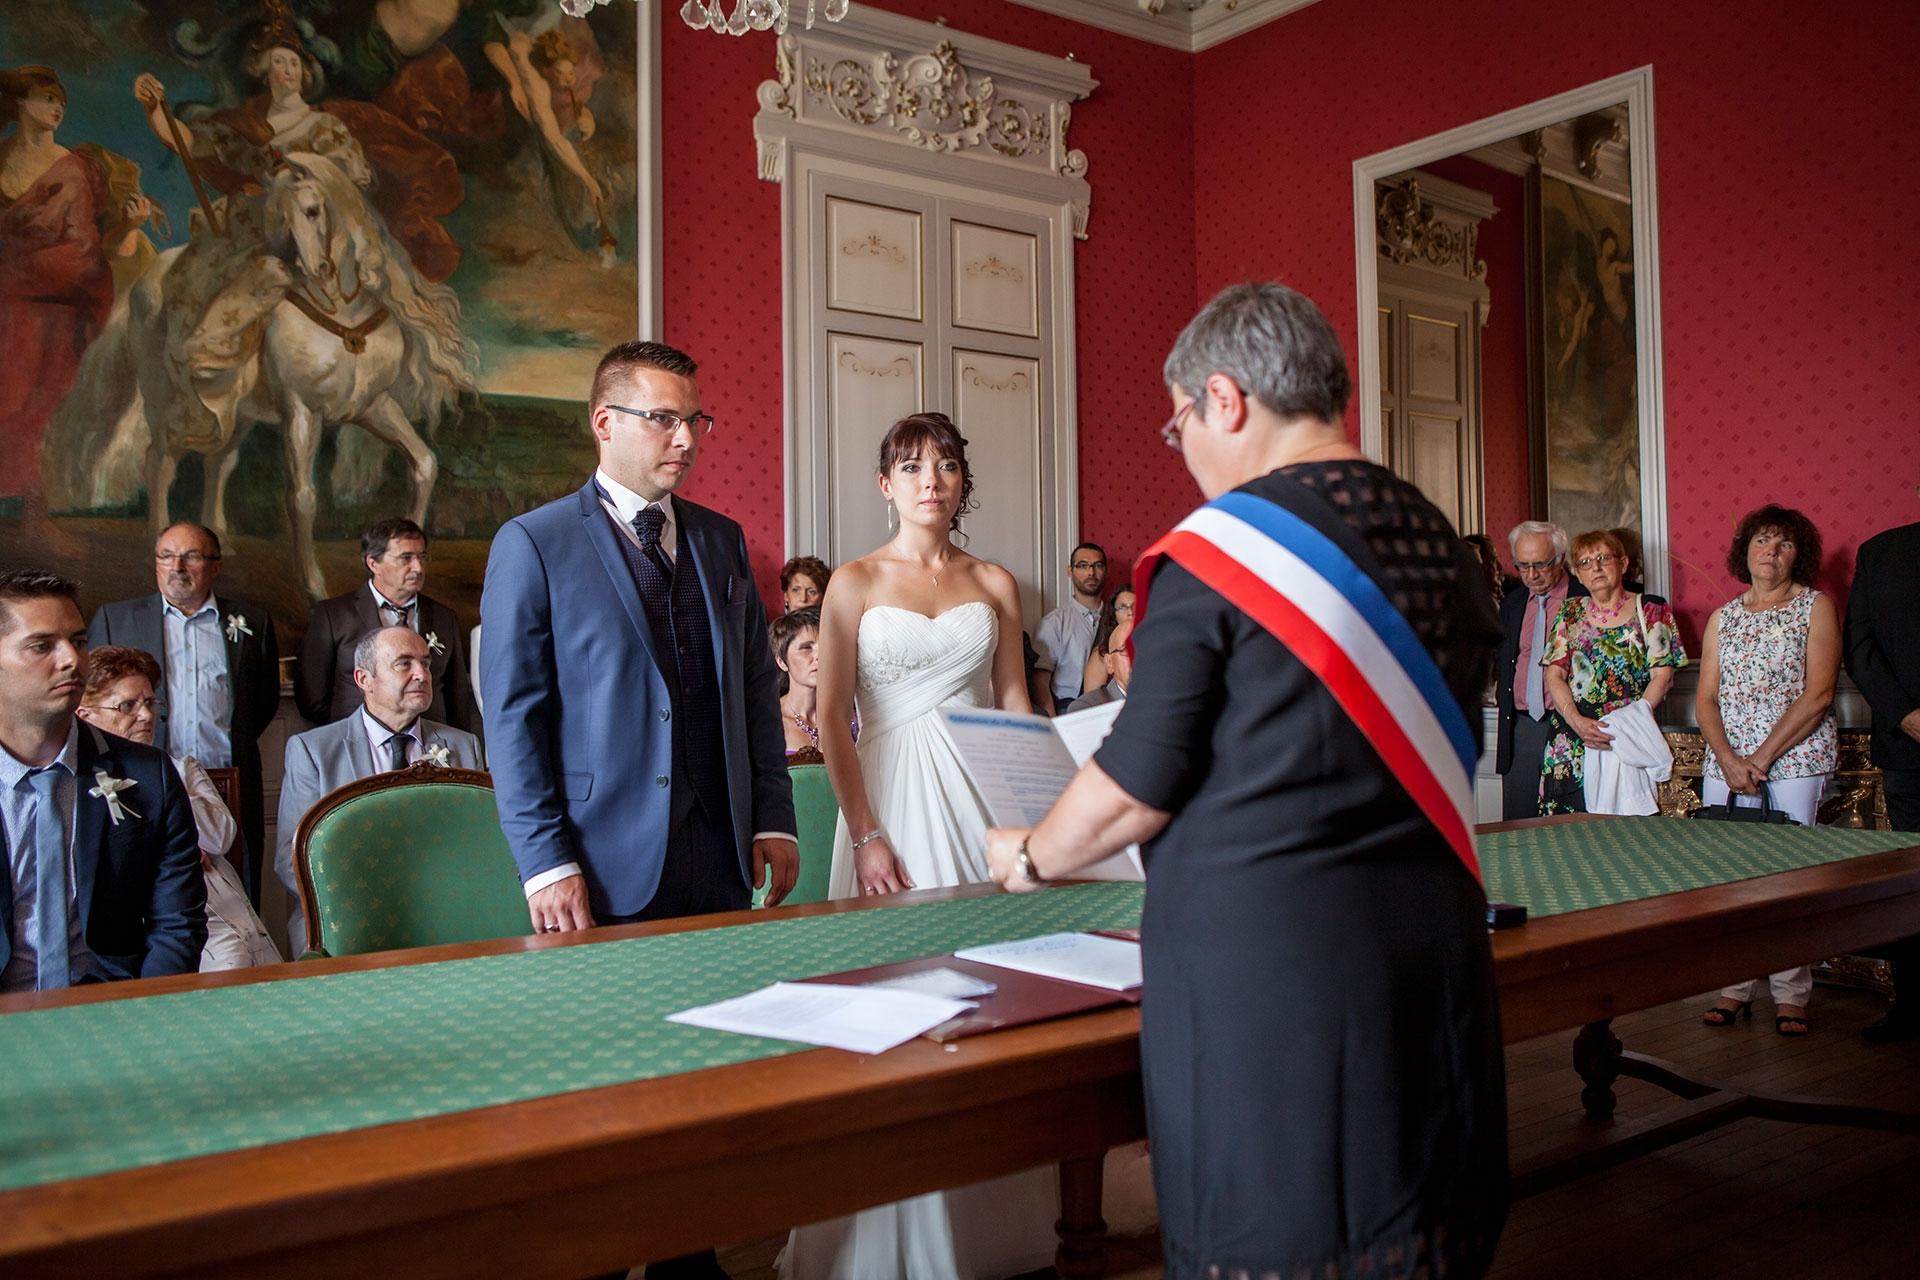 particuliers-evenements-mariages-oui-aurelie&geoffrey-01